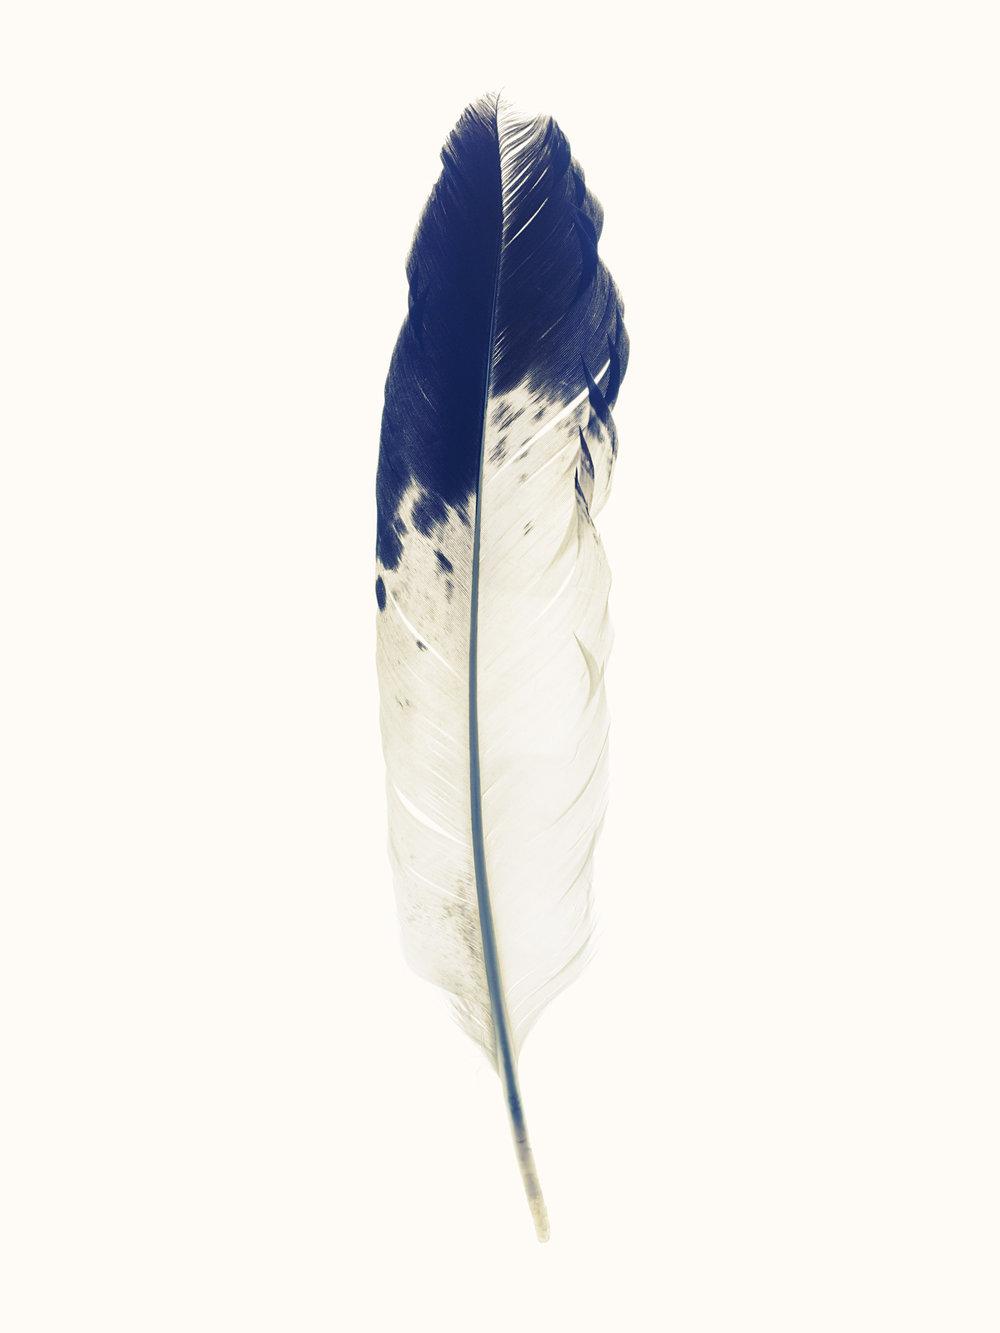 1_LyleOwerko_Eagle Hunter Feather4_2015_Giclee on Textured Fine Art Paper_ 60 x 90.jpg